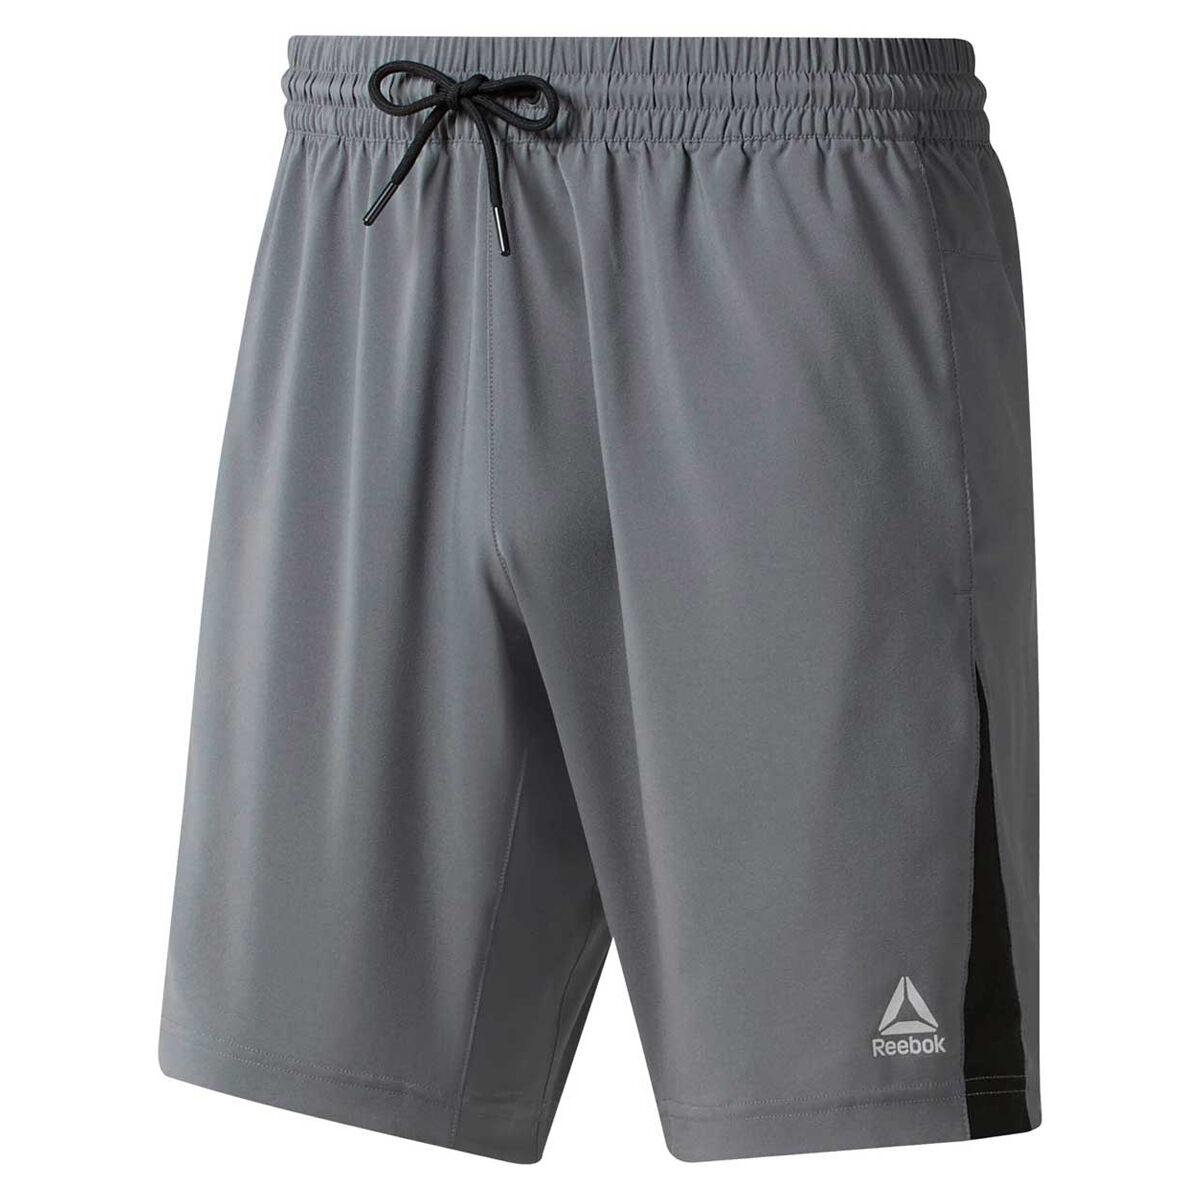 Reebok Mens Elements Woven Shorts Grey S